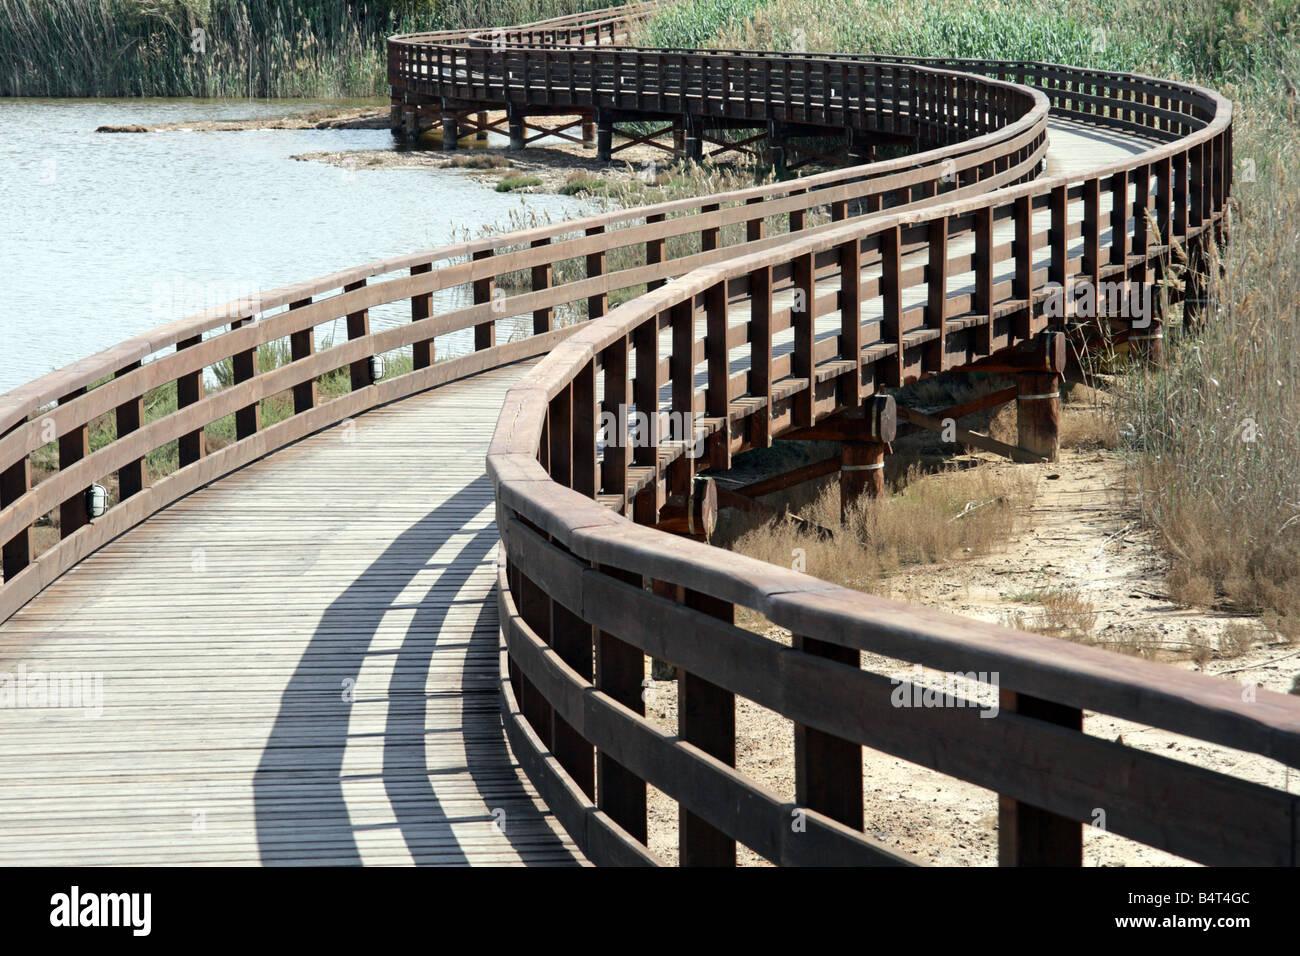 Wooden Bridge in Cagliari, Sardinia, Italy. - Stock Image